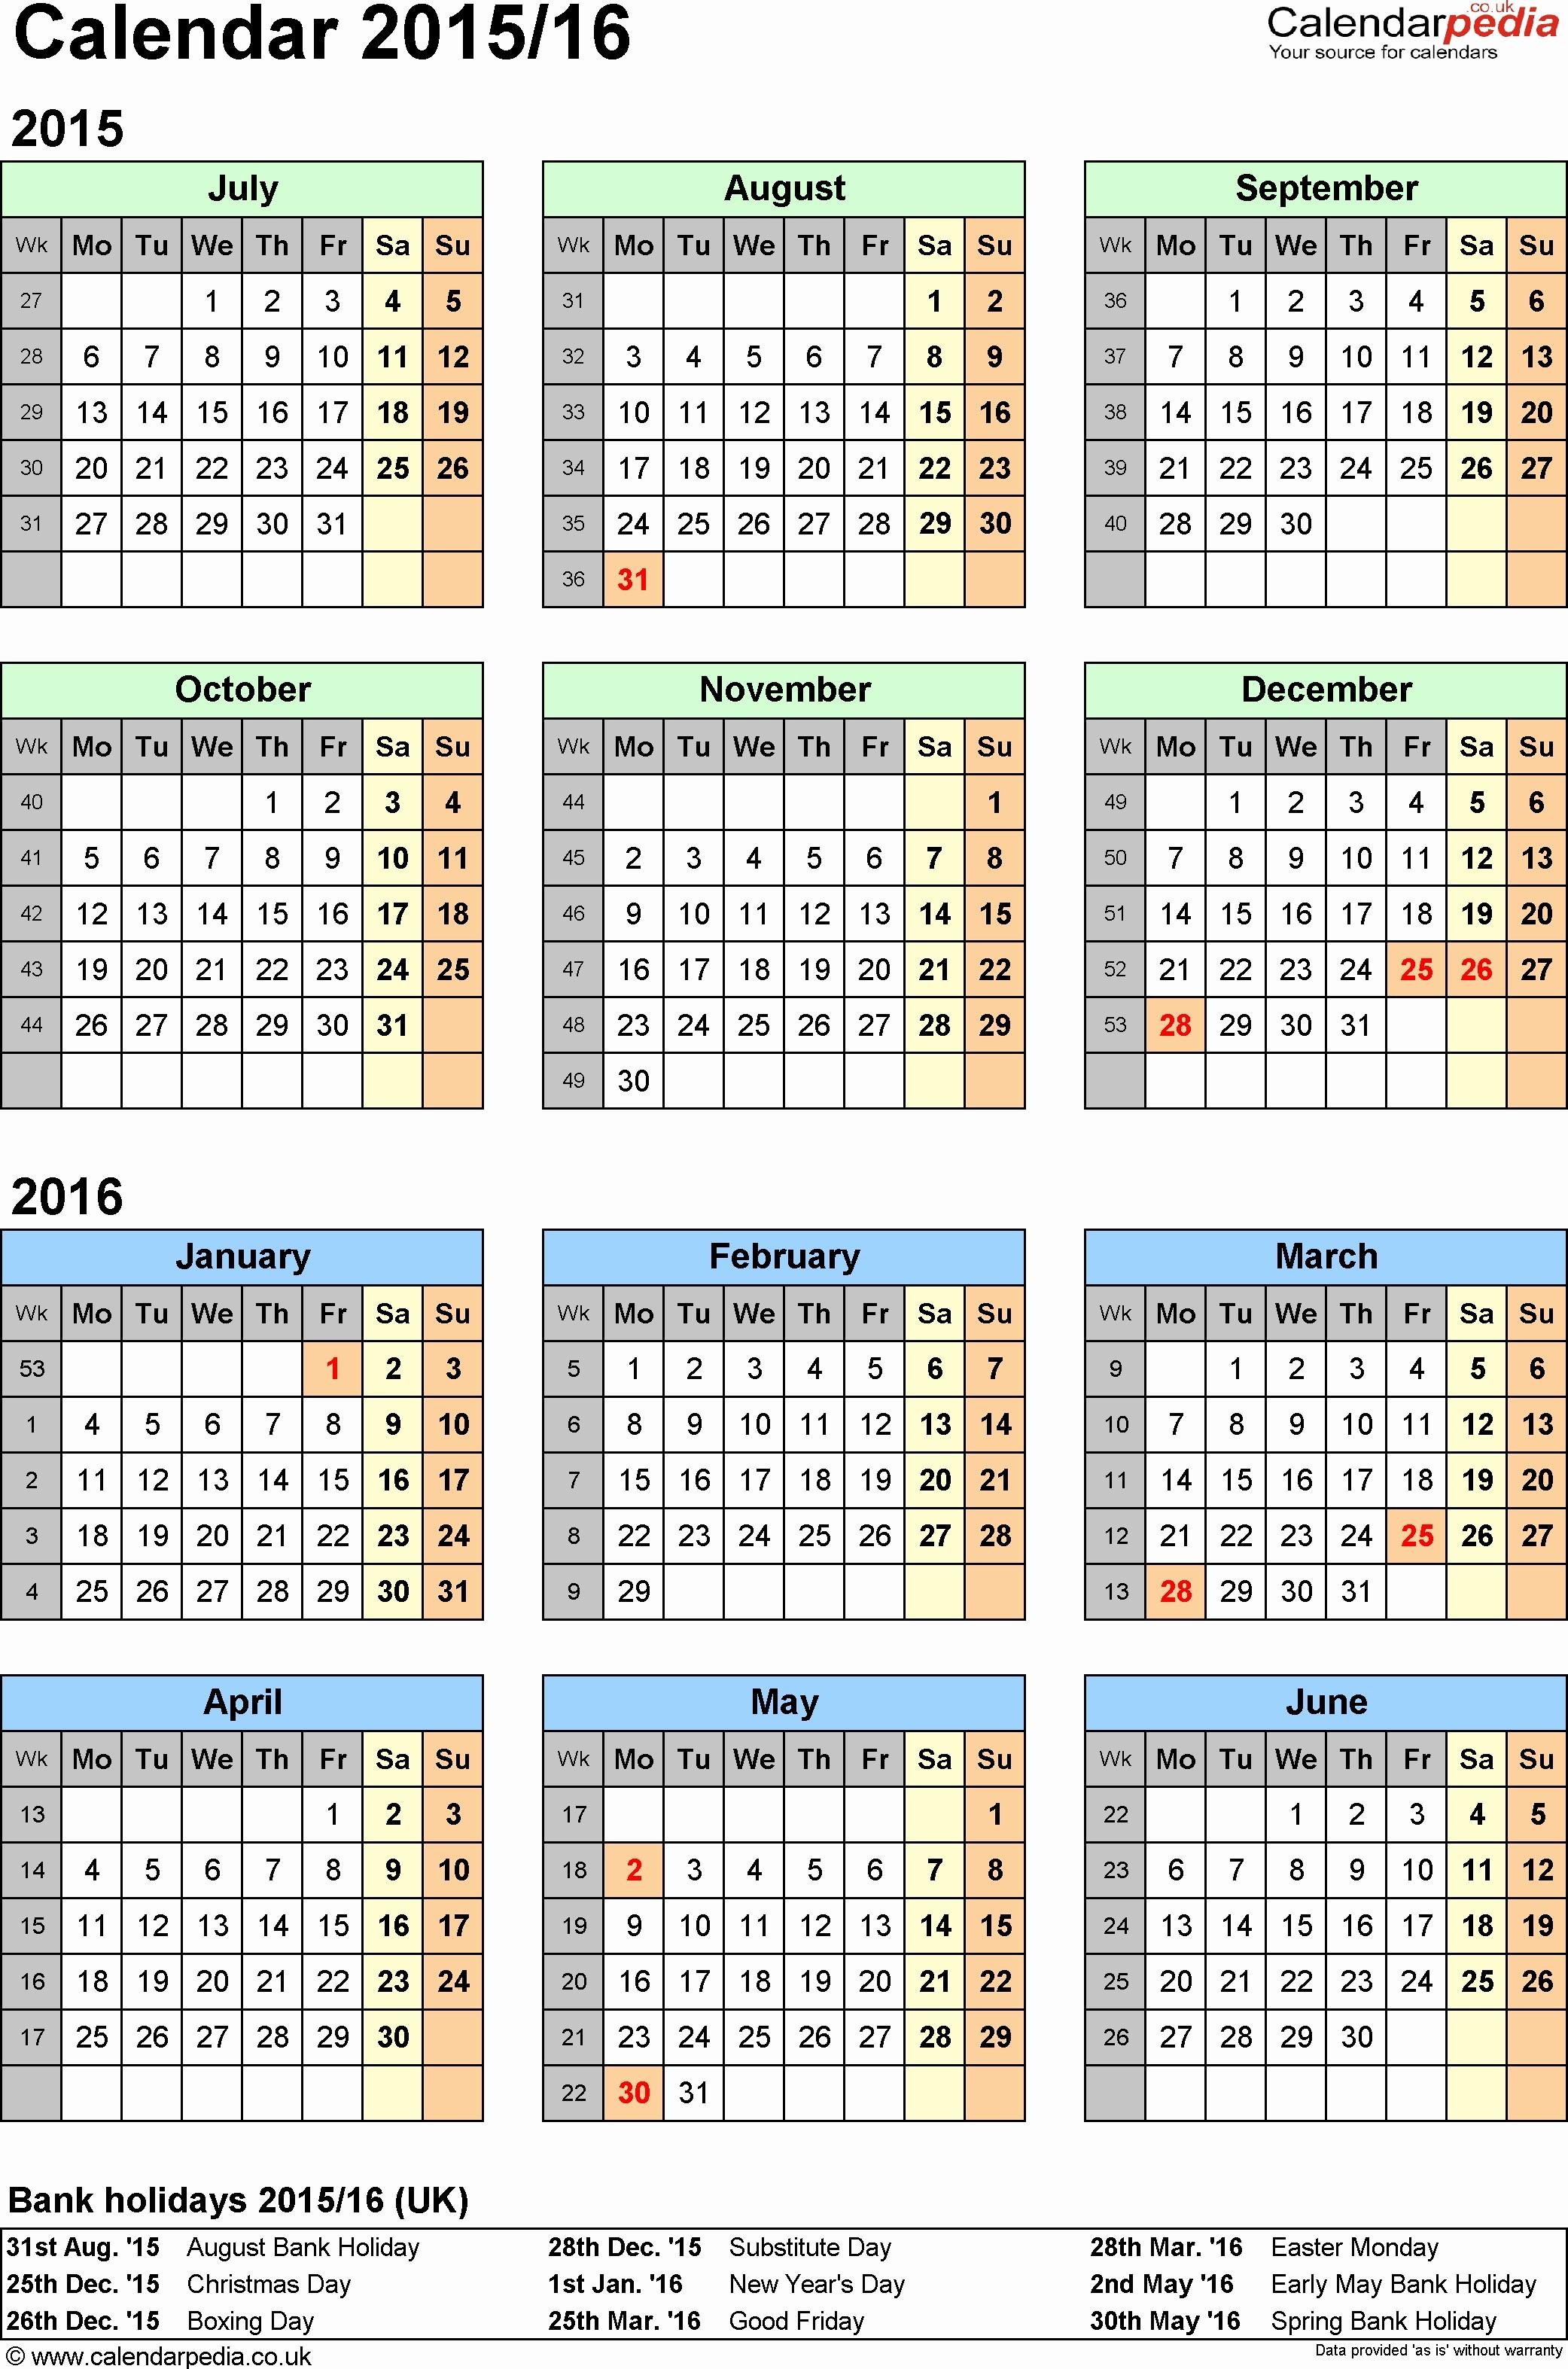 Fiscal Year Calendar 2016 Template Luxury Army Fiscal Year 2016 Calendar